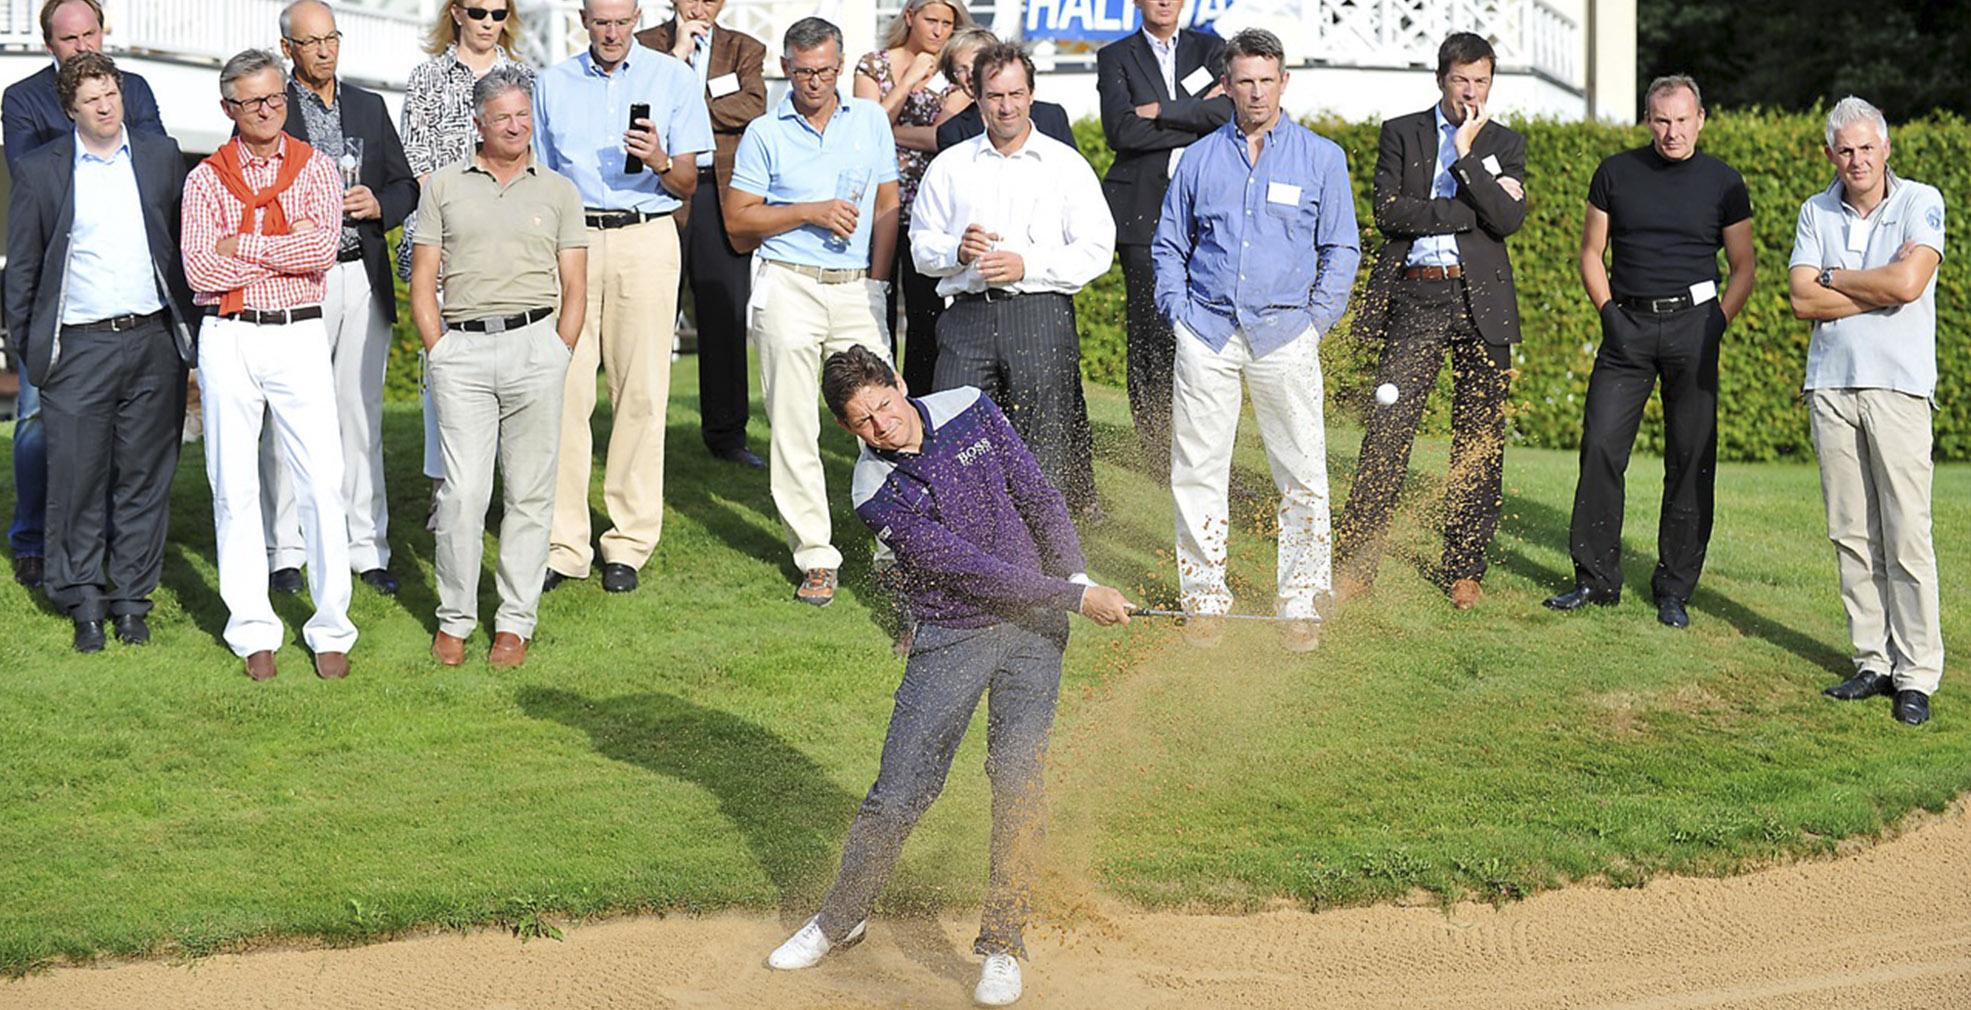 ... golf as profession